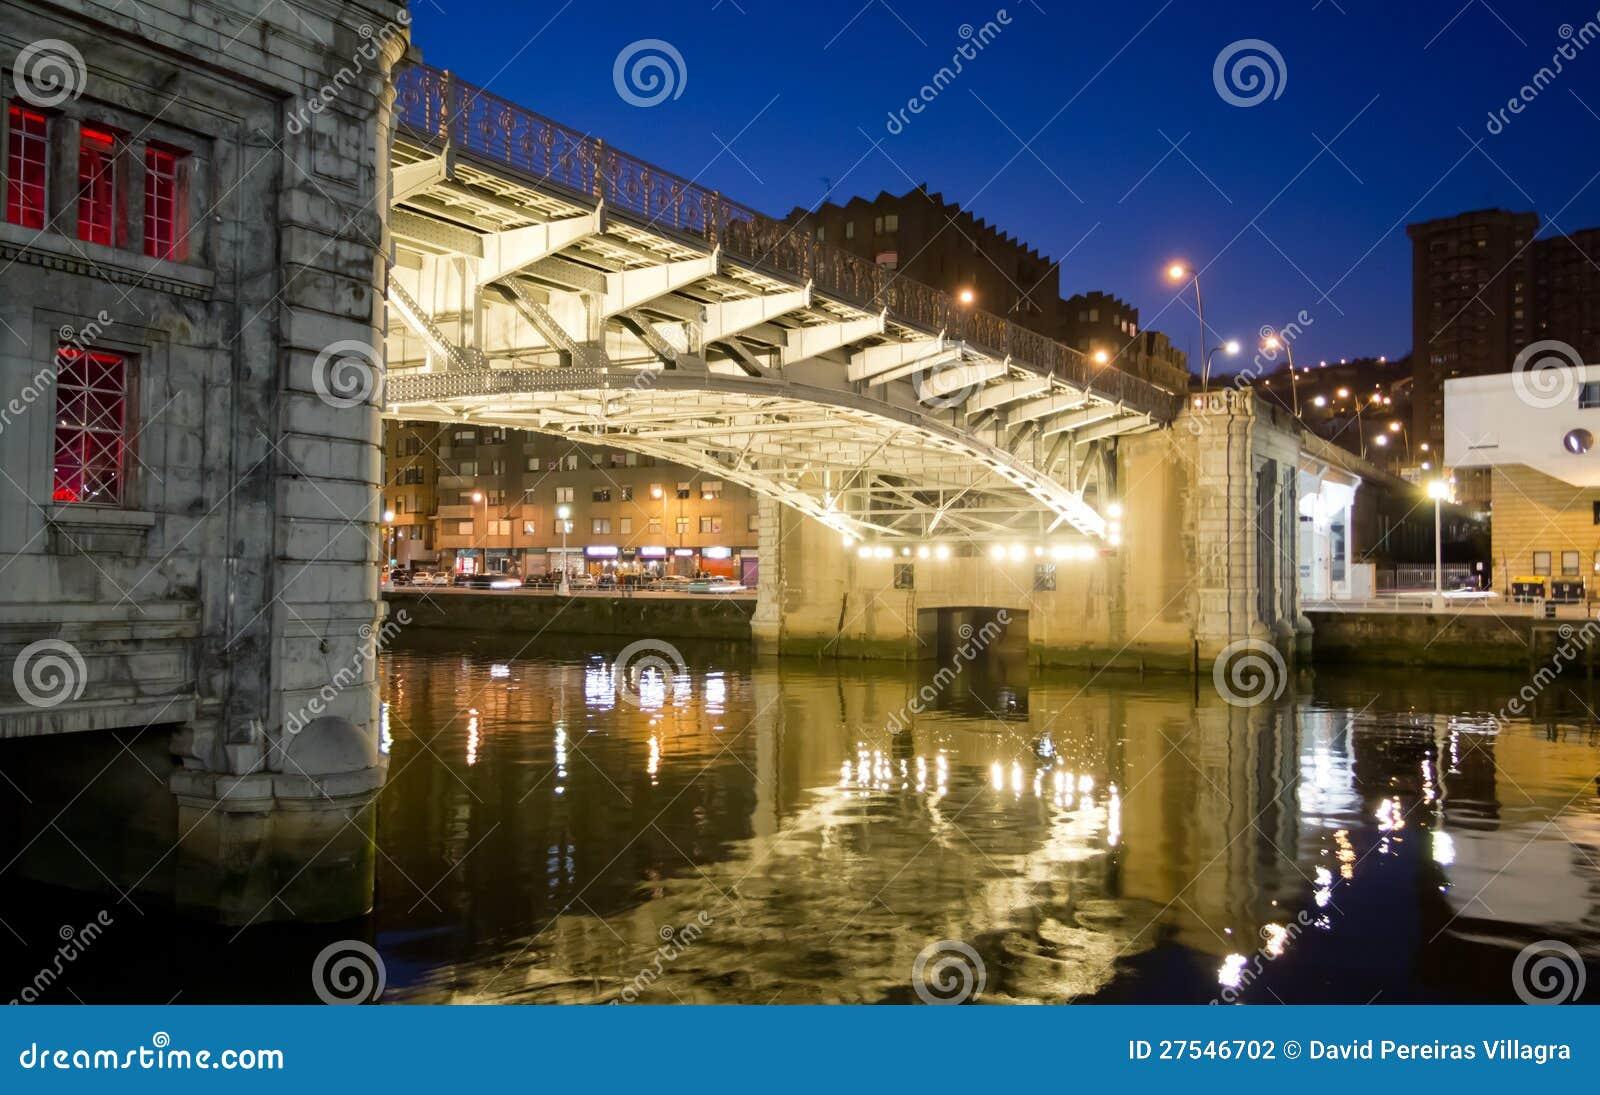 Bilbao river promenade at night